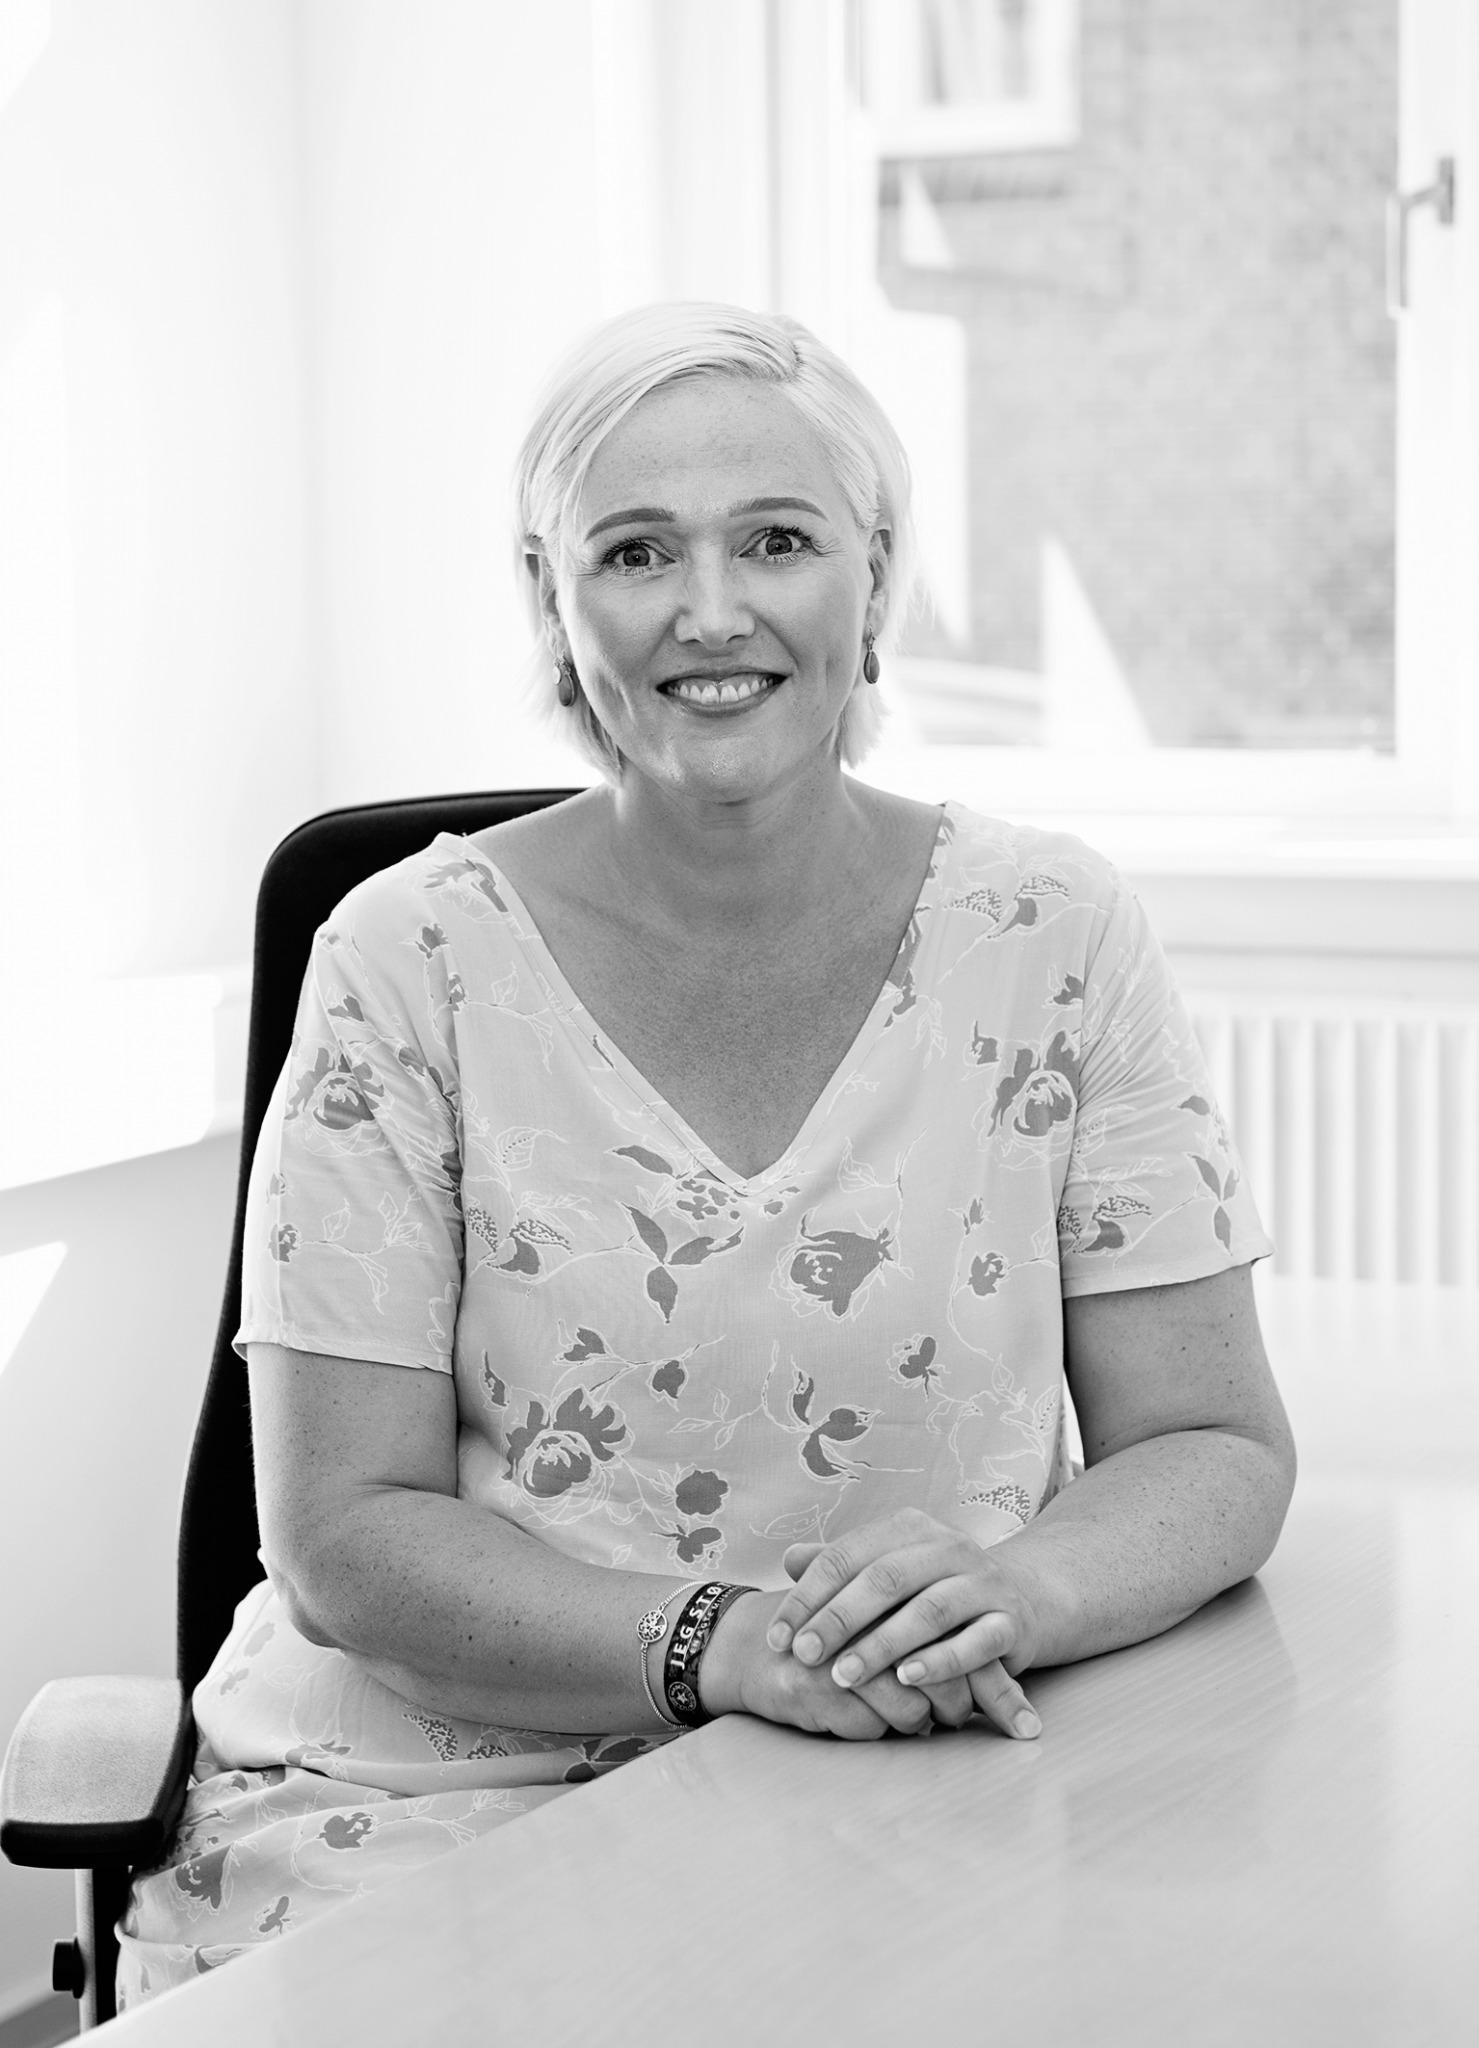 Kirstine Marie Wisbech Rasmussen